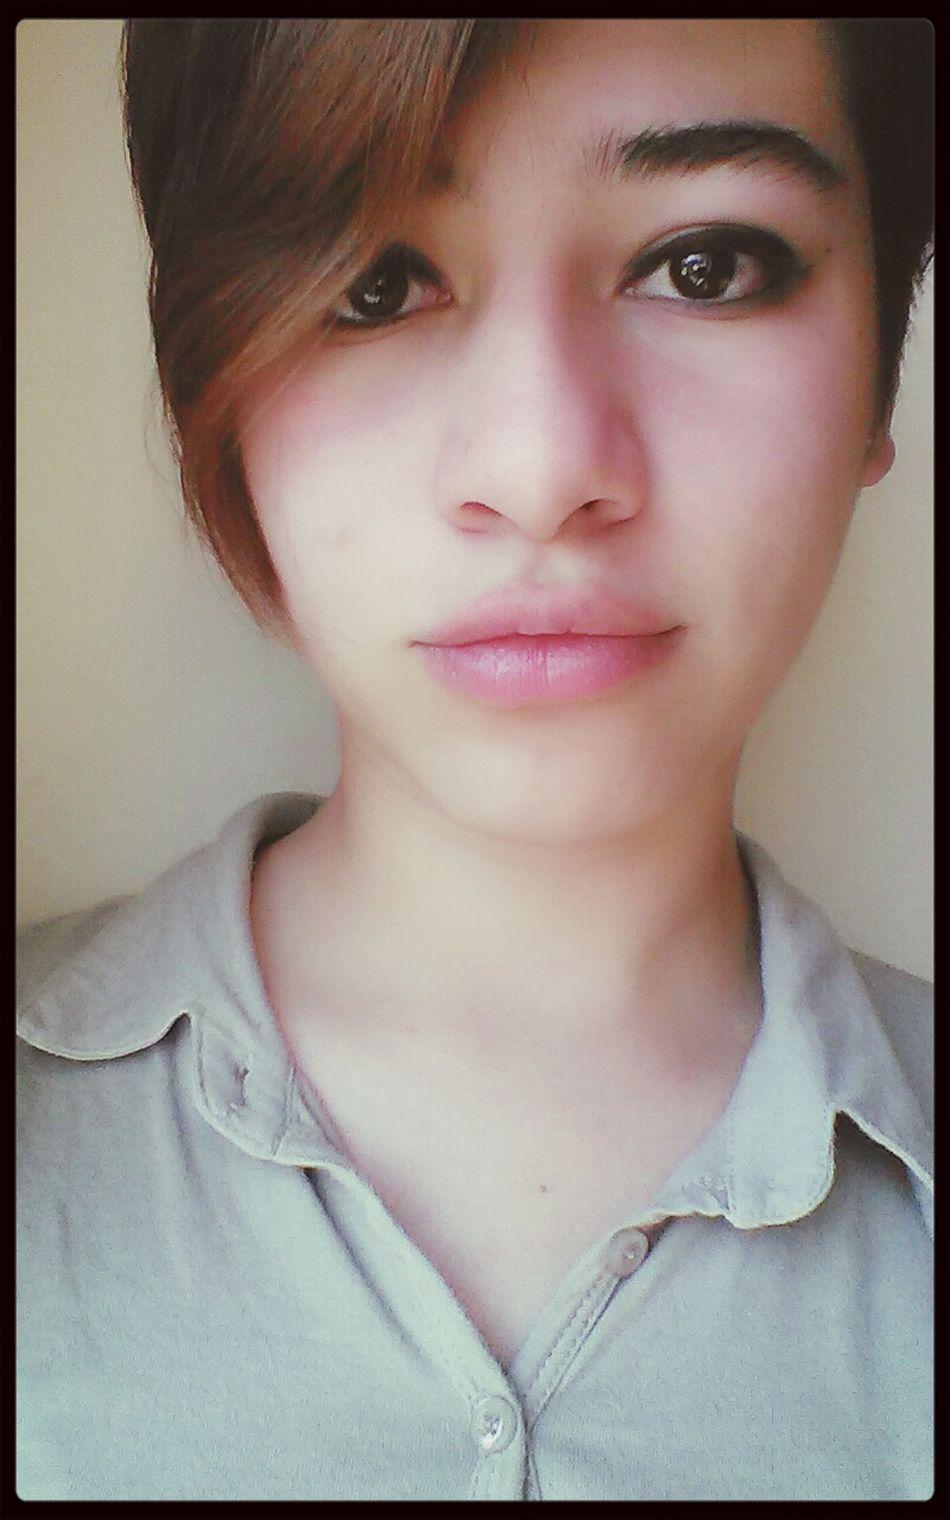 That's Me Quemada :(